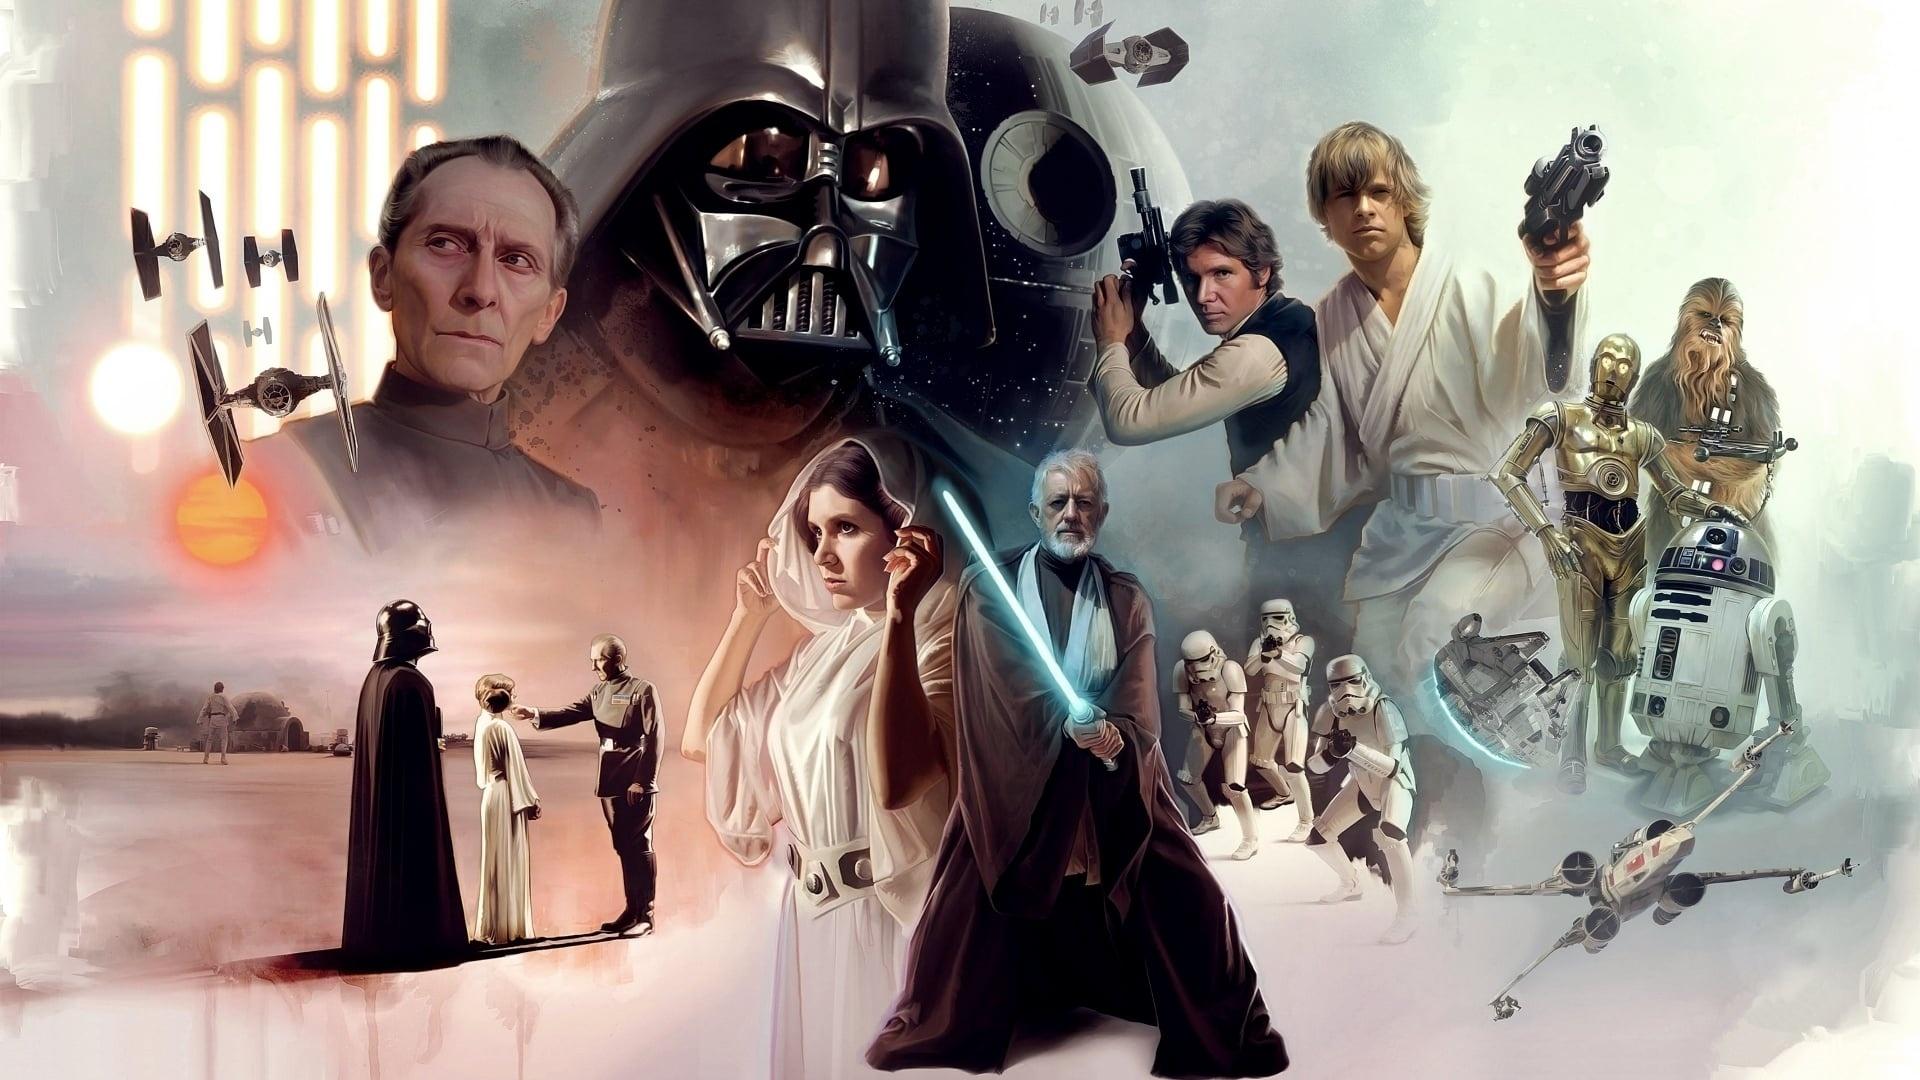 Star Wars cool wallpaper